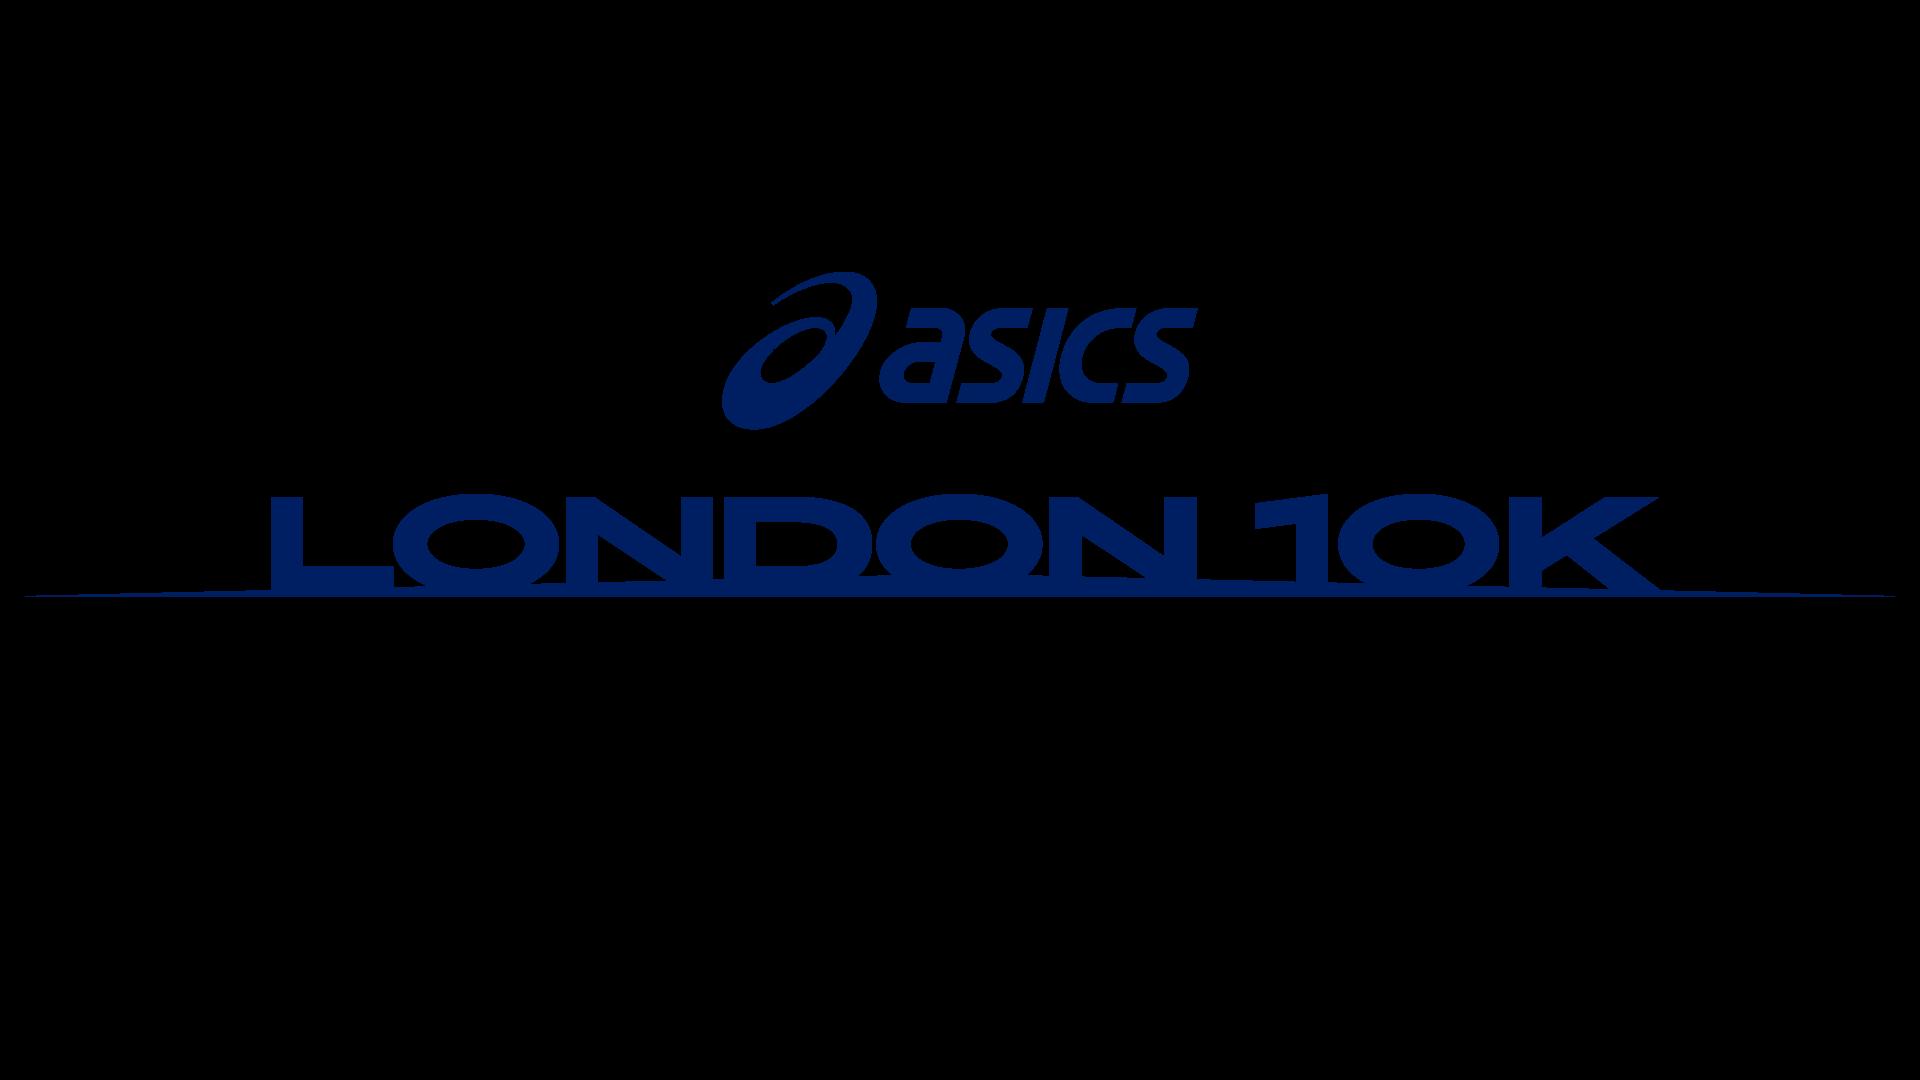 london 10k logo